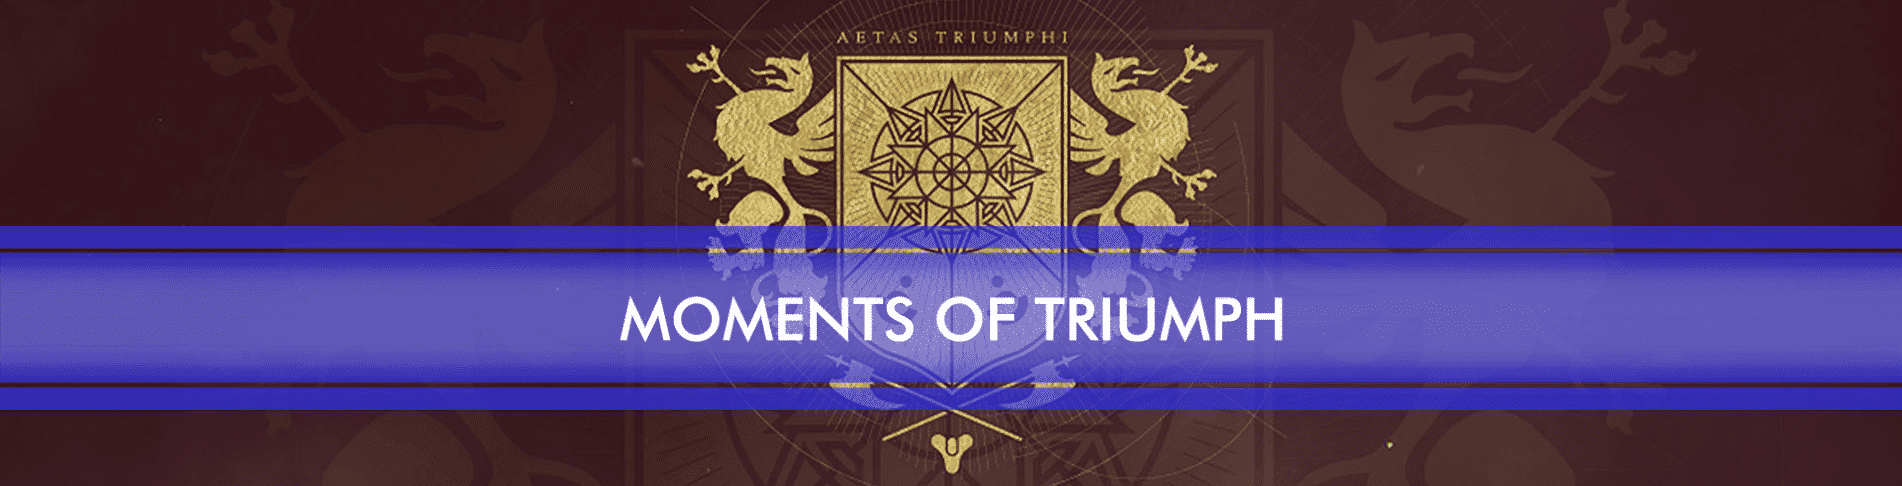 moments of triumph blog post